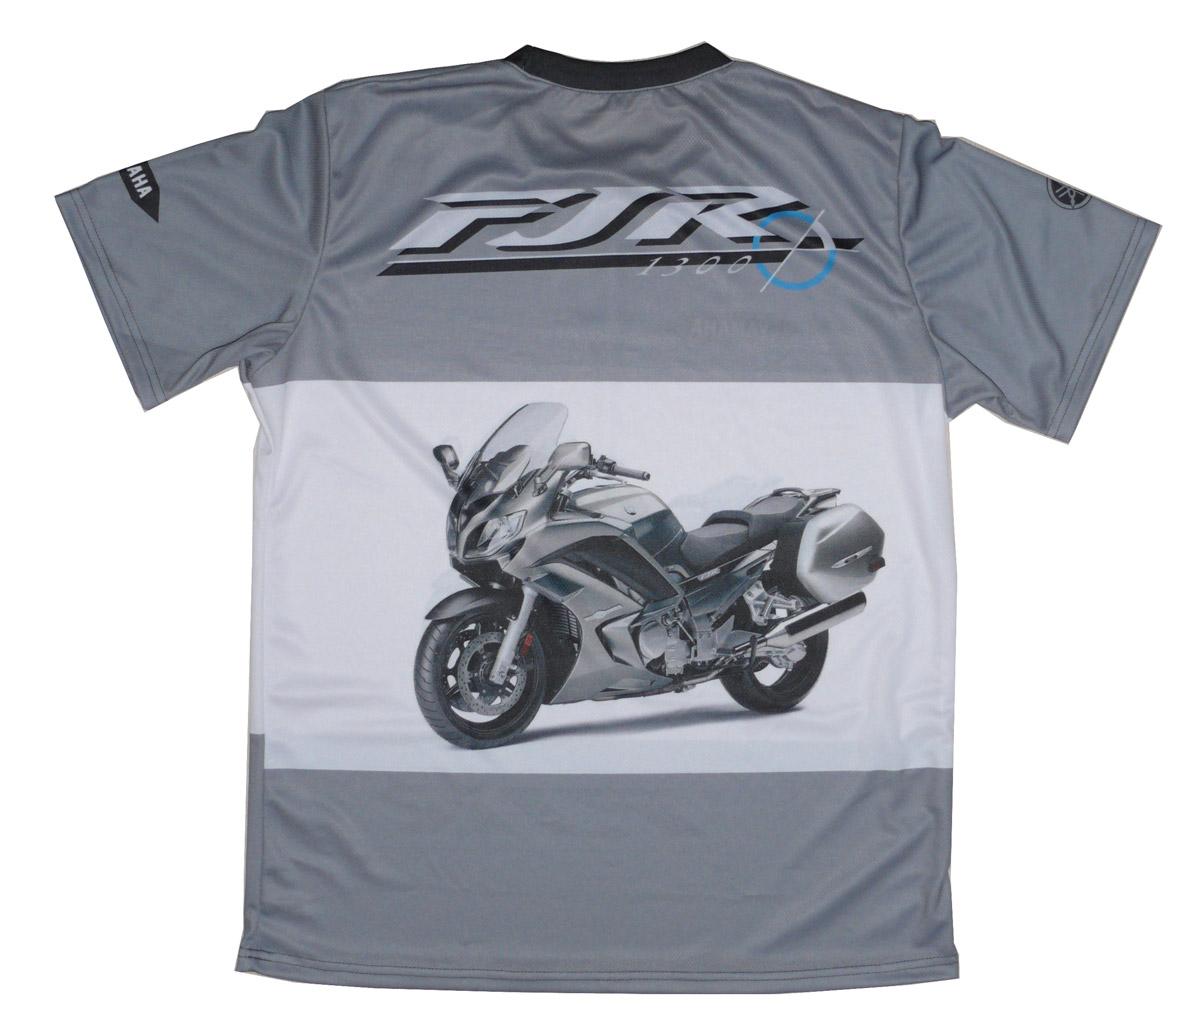 Yamaha Fjr 1300 T Shirt With Logo And All Over Printed